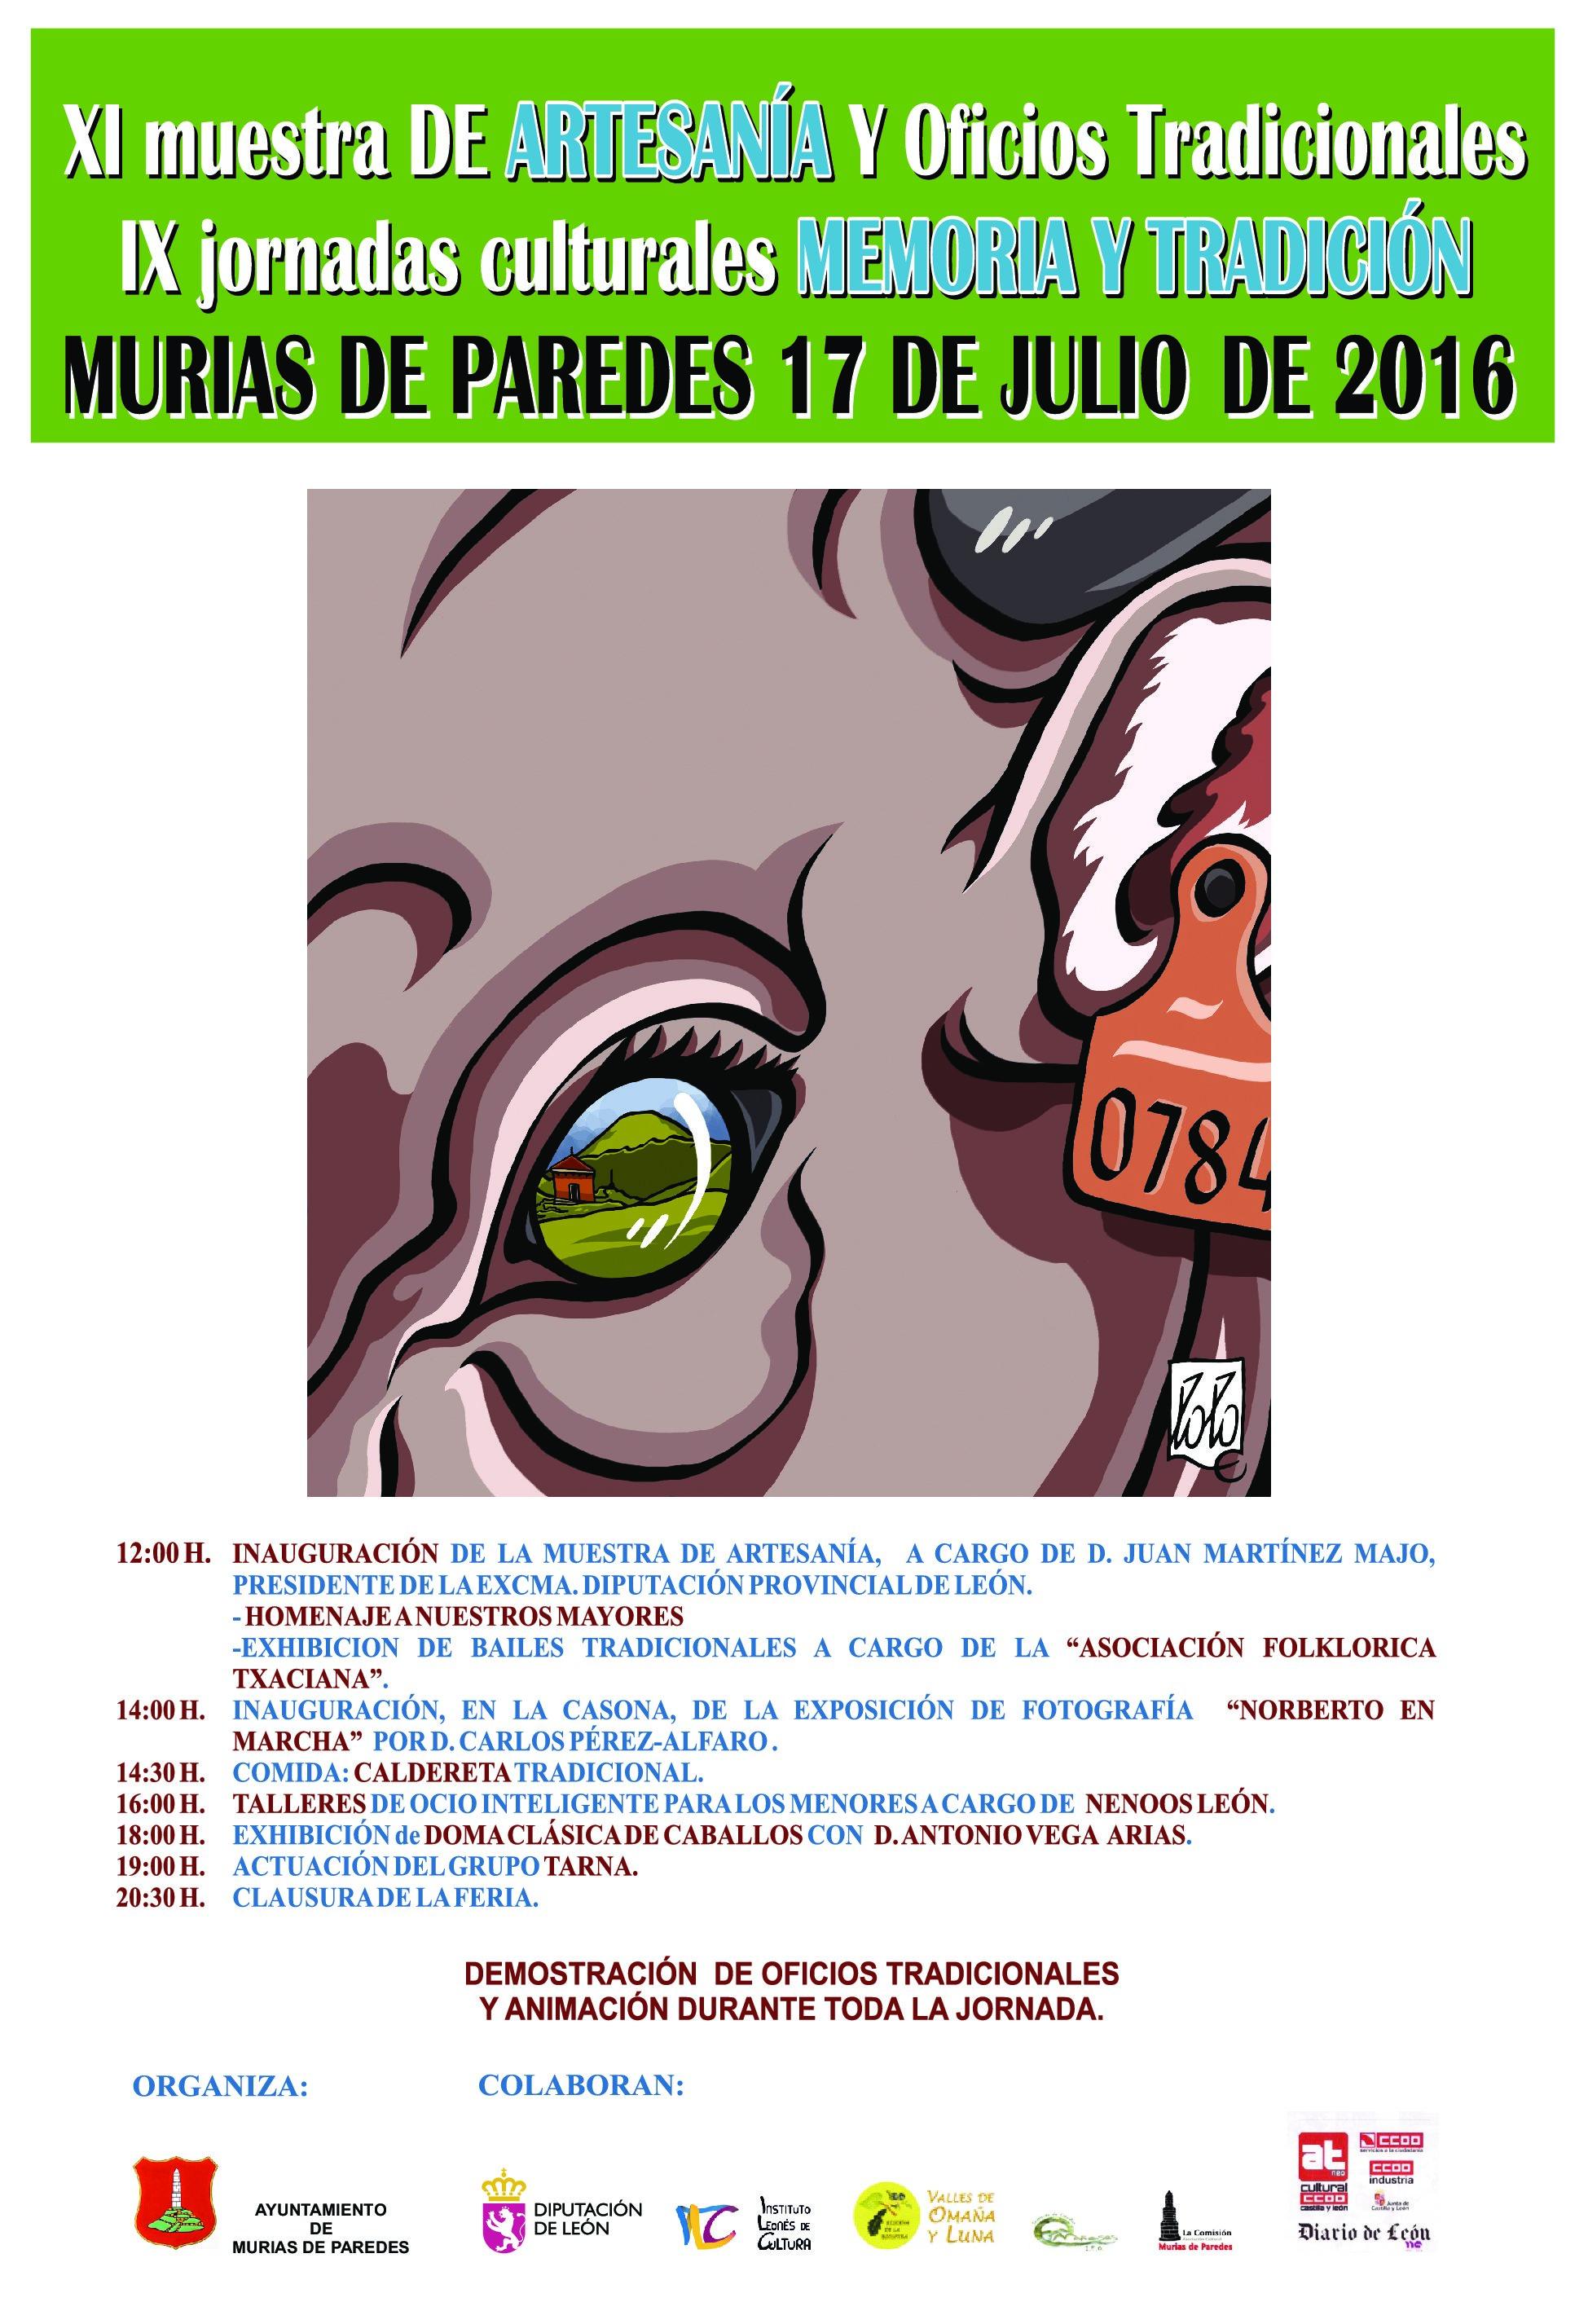 http://www.aytomuriasdeparedes.es/export/sites/aytomuriasdeparedes/galerias/imagenes/eventos/2016/CARTEL_FERIA_2016.jpg?__scale=w:800,h:600,t:1,q:90